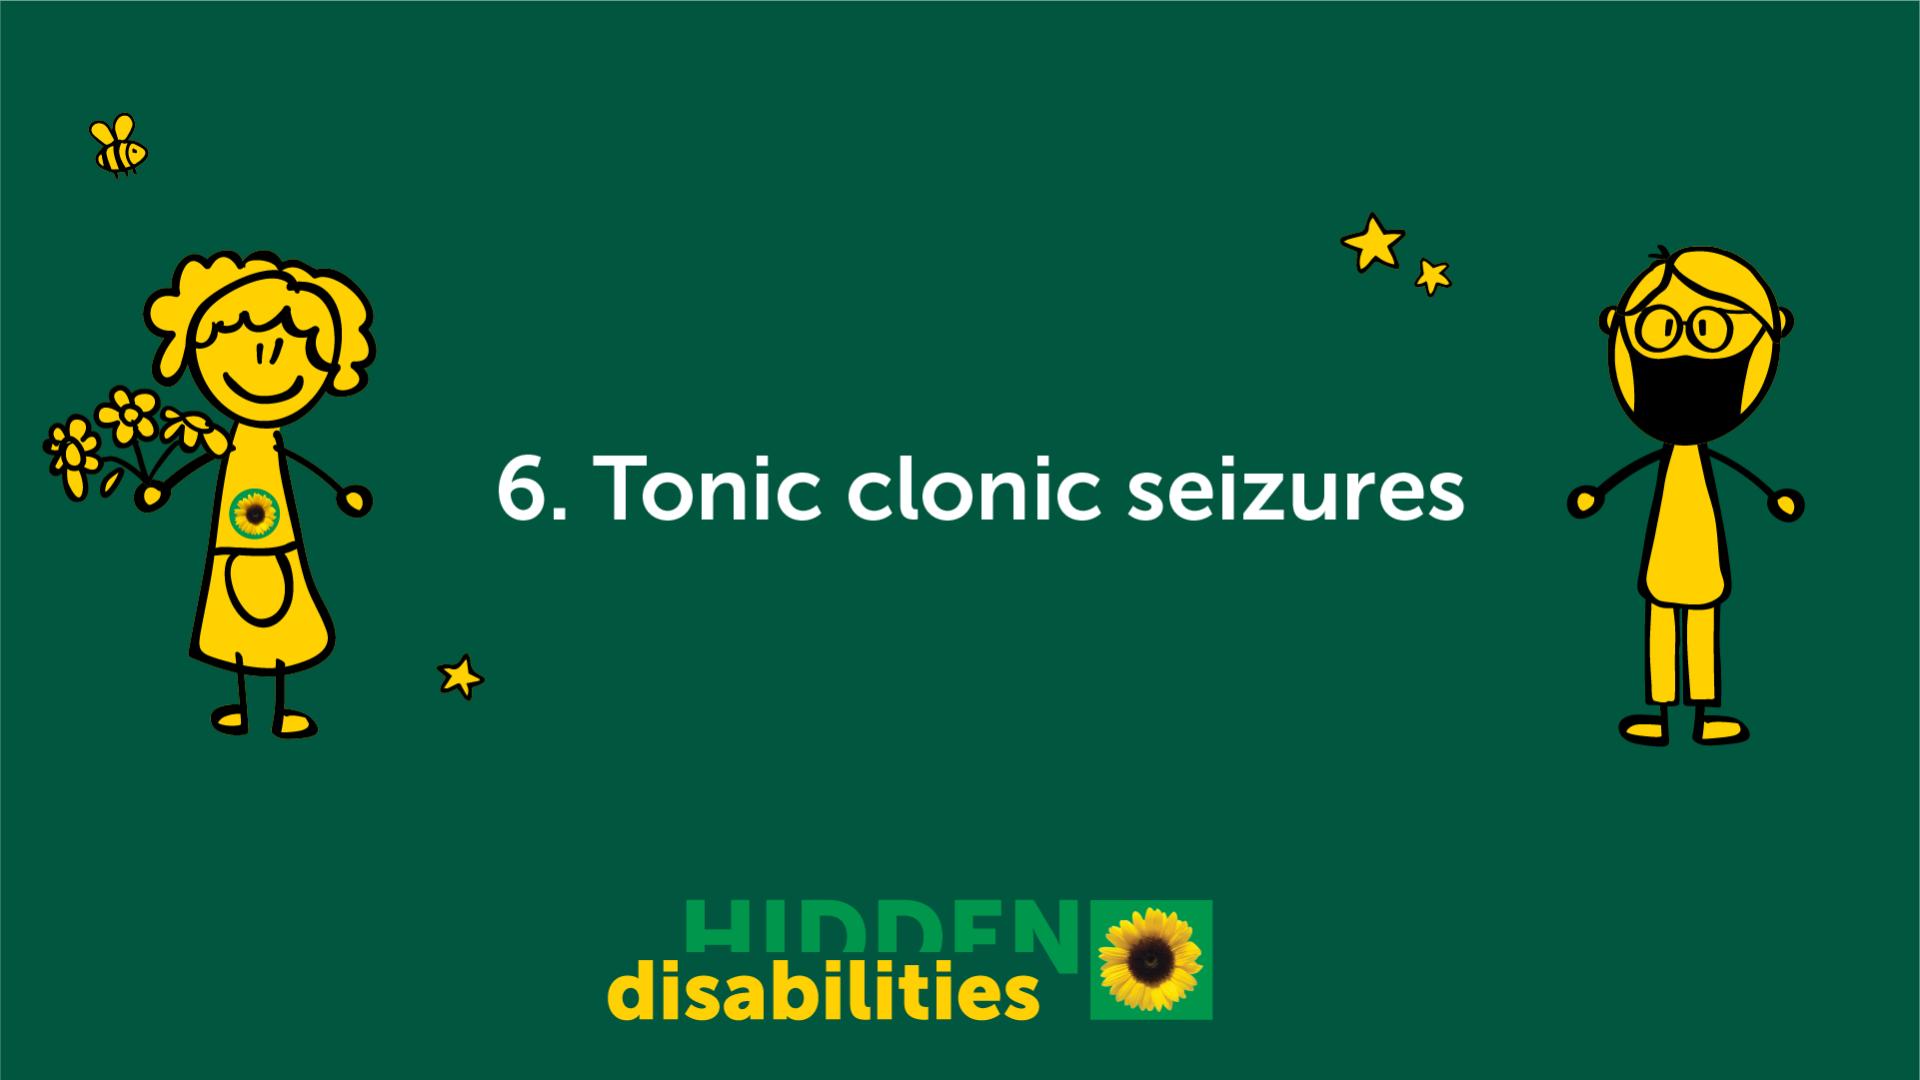 Tonic clonic seizures